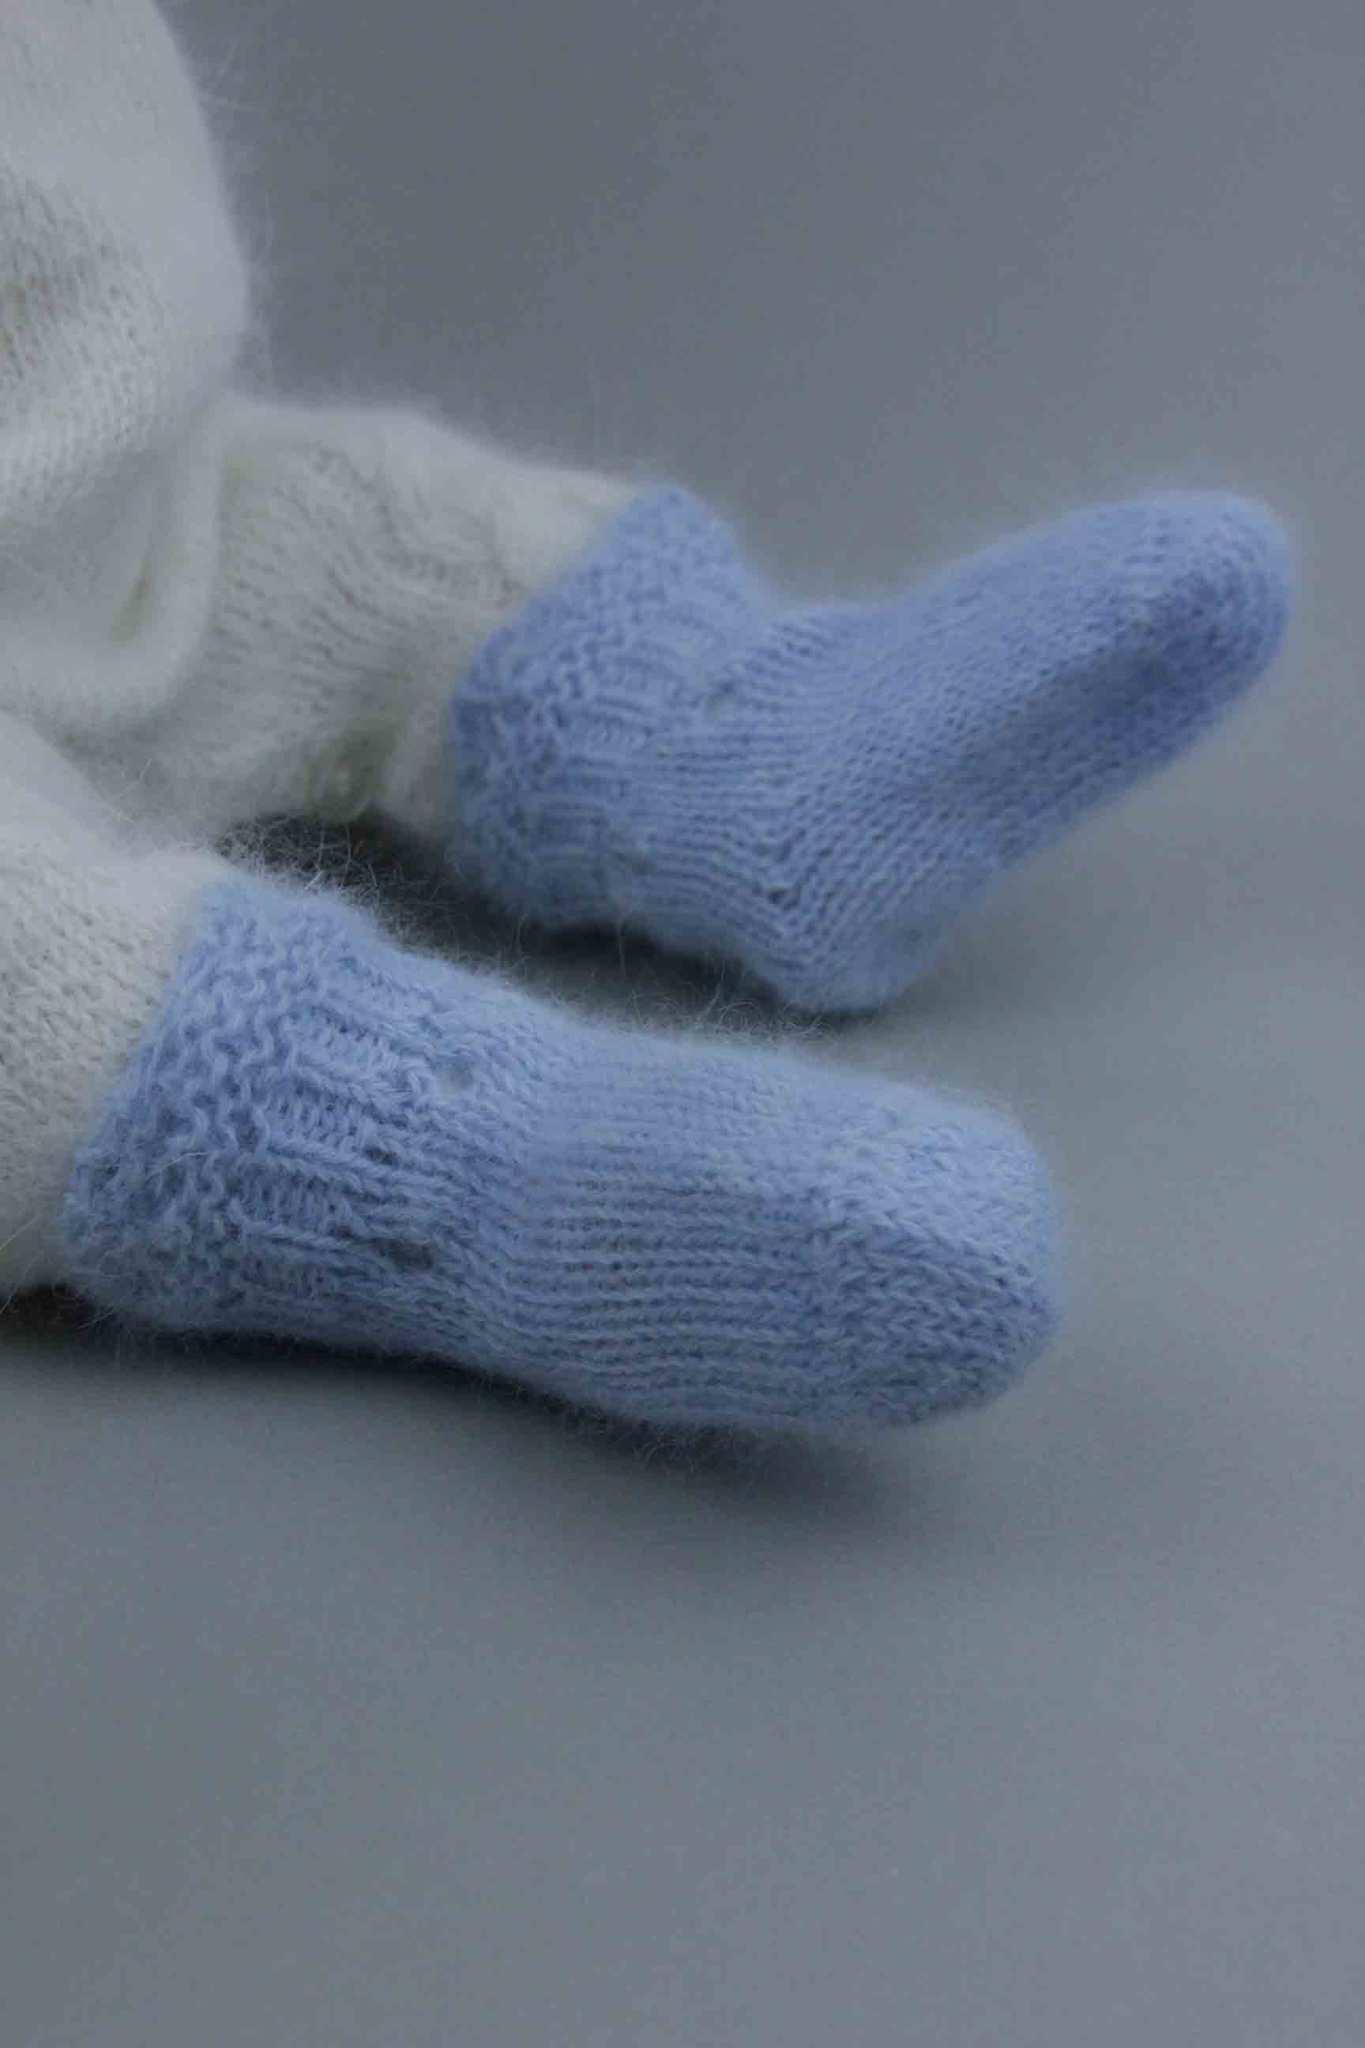 Angora_newborn_baby_socks_skyblue_56_1